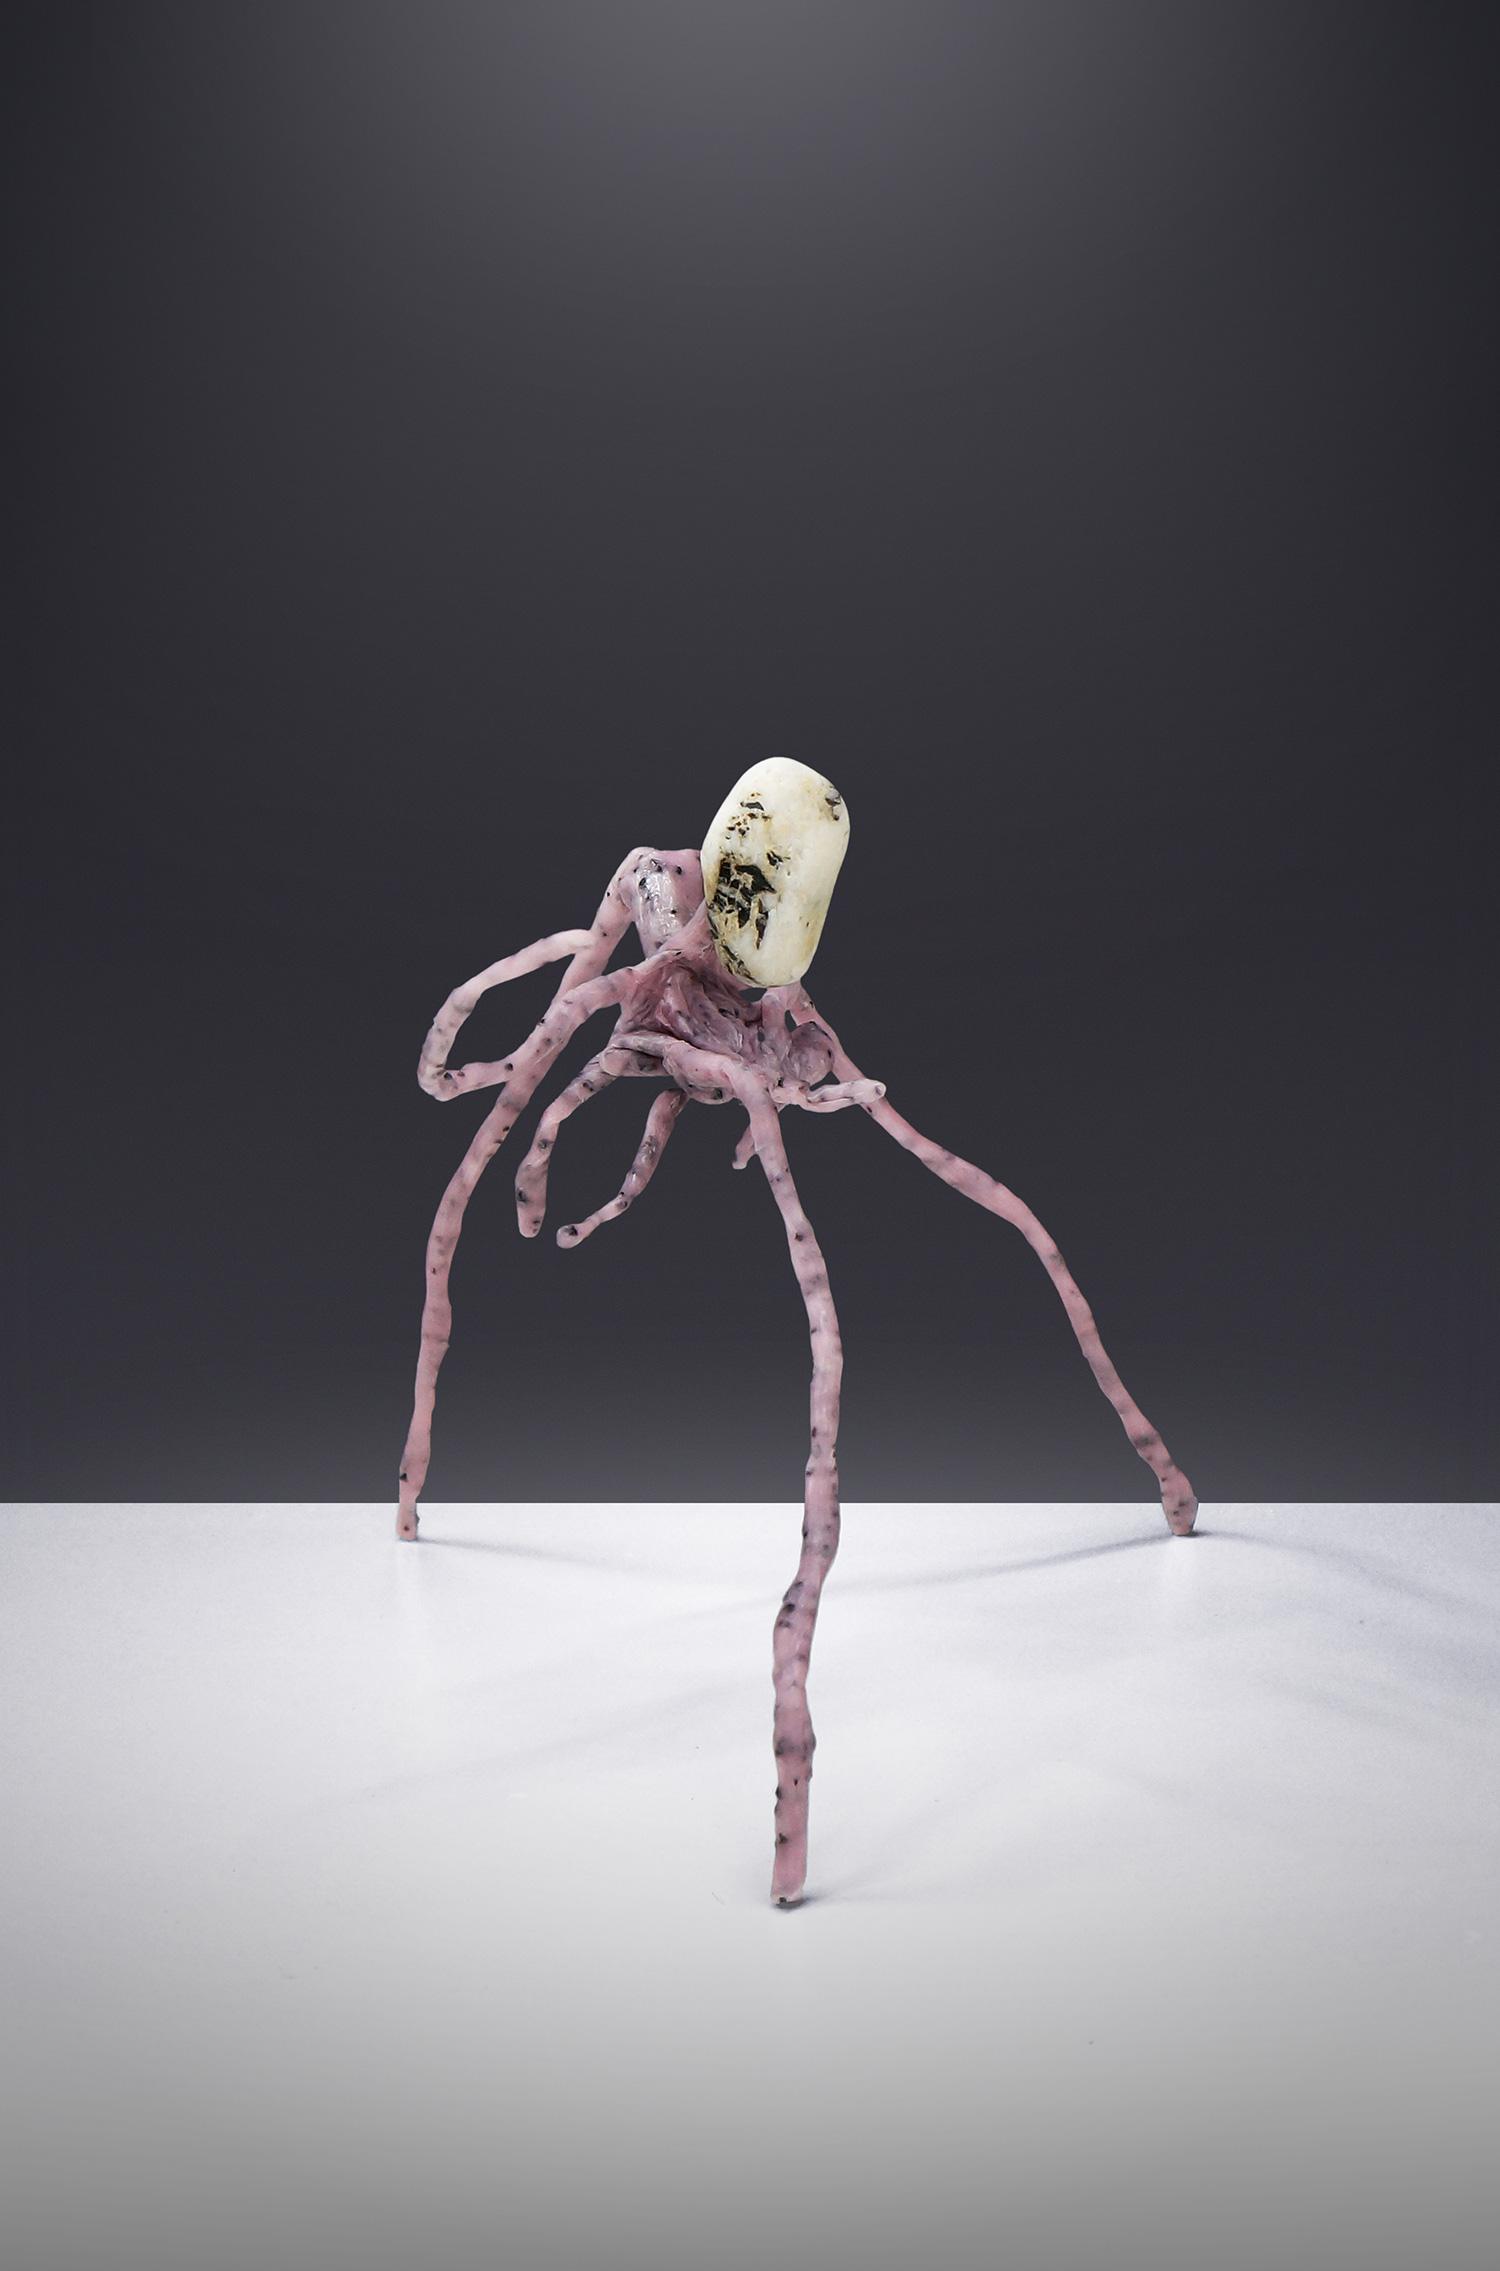 Ilya Fedotov-Fedorov, Poisons Museum, leggy creature